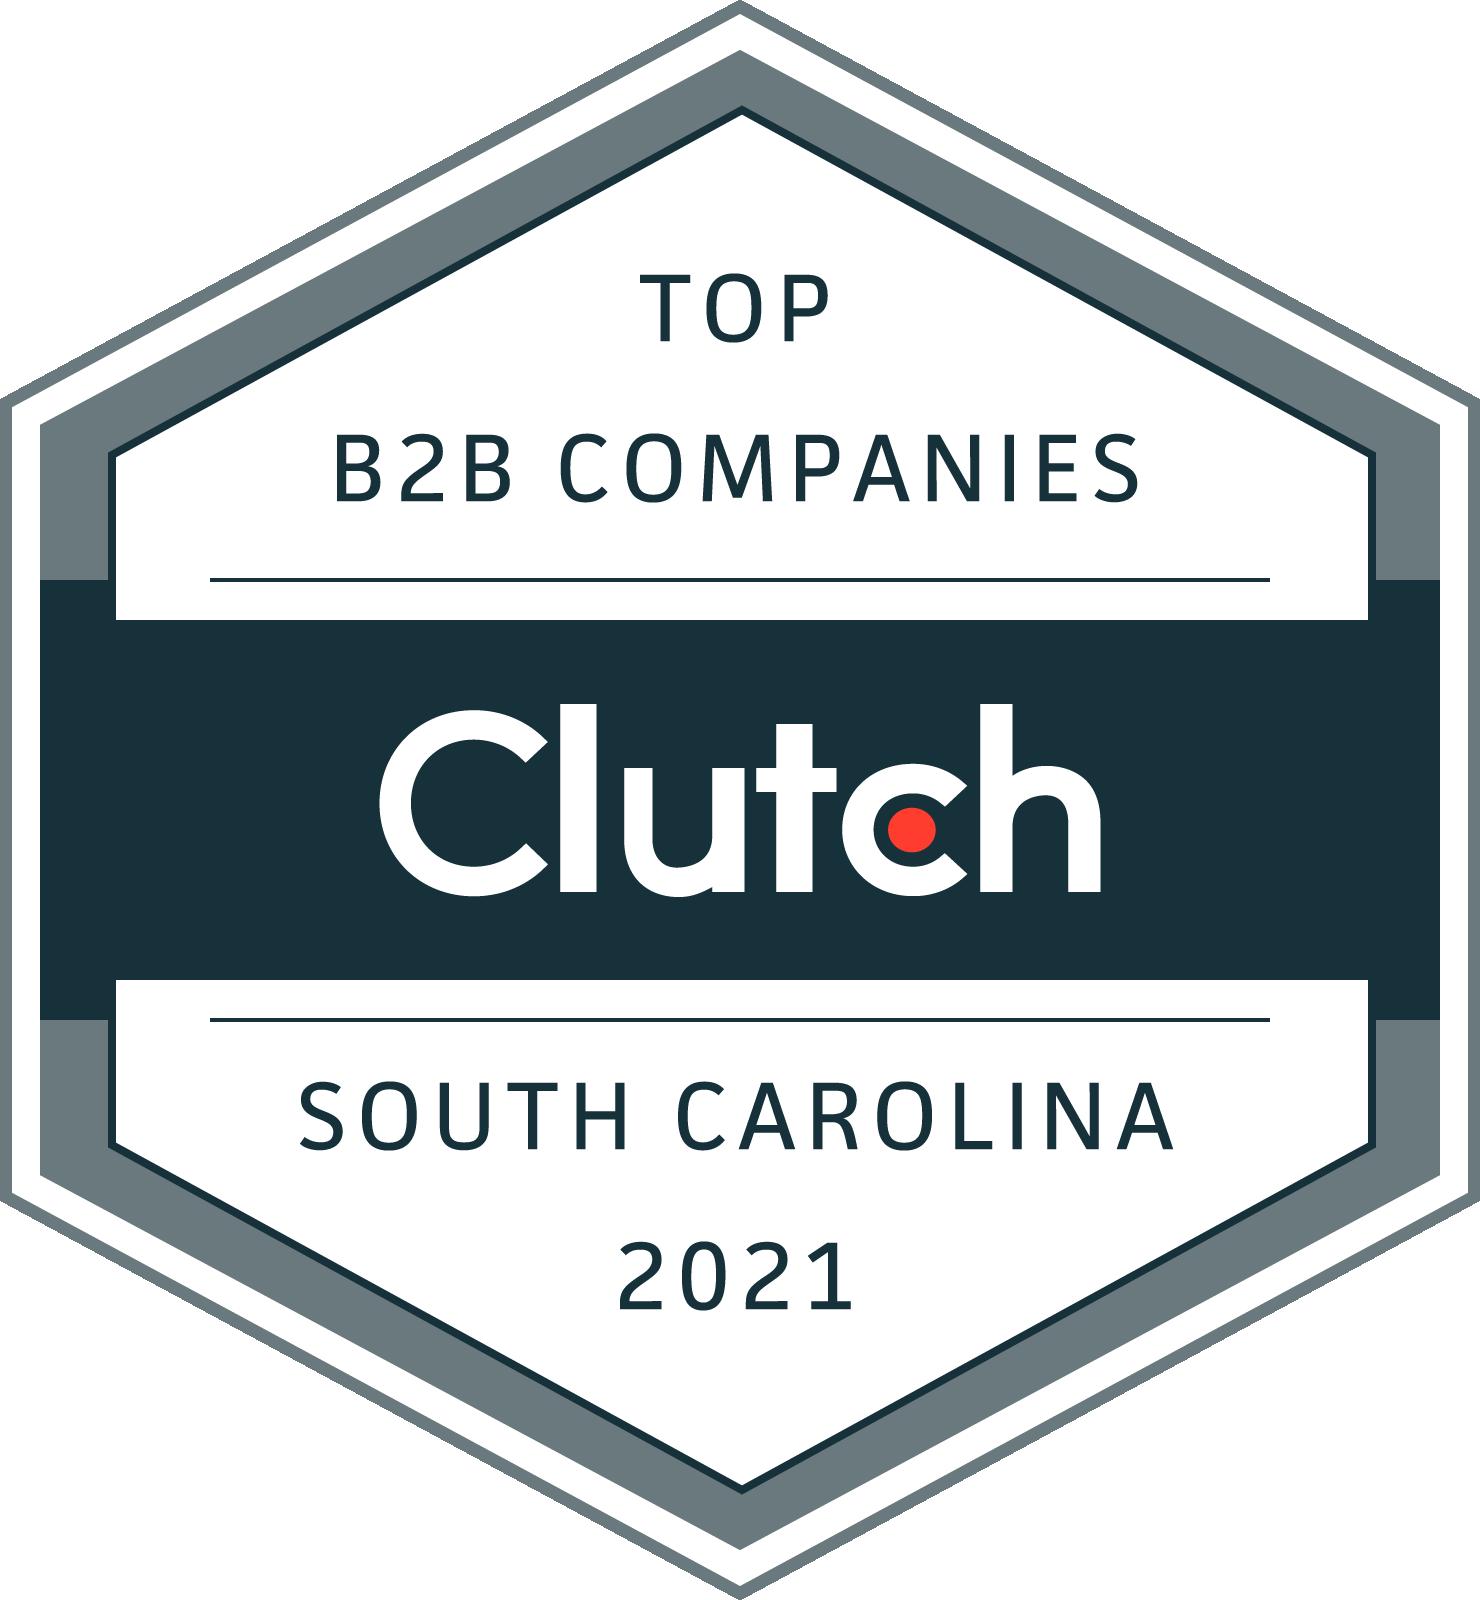 South Carolina B2B Leaders Badge 2021